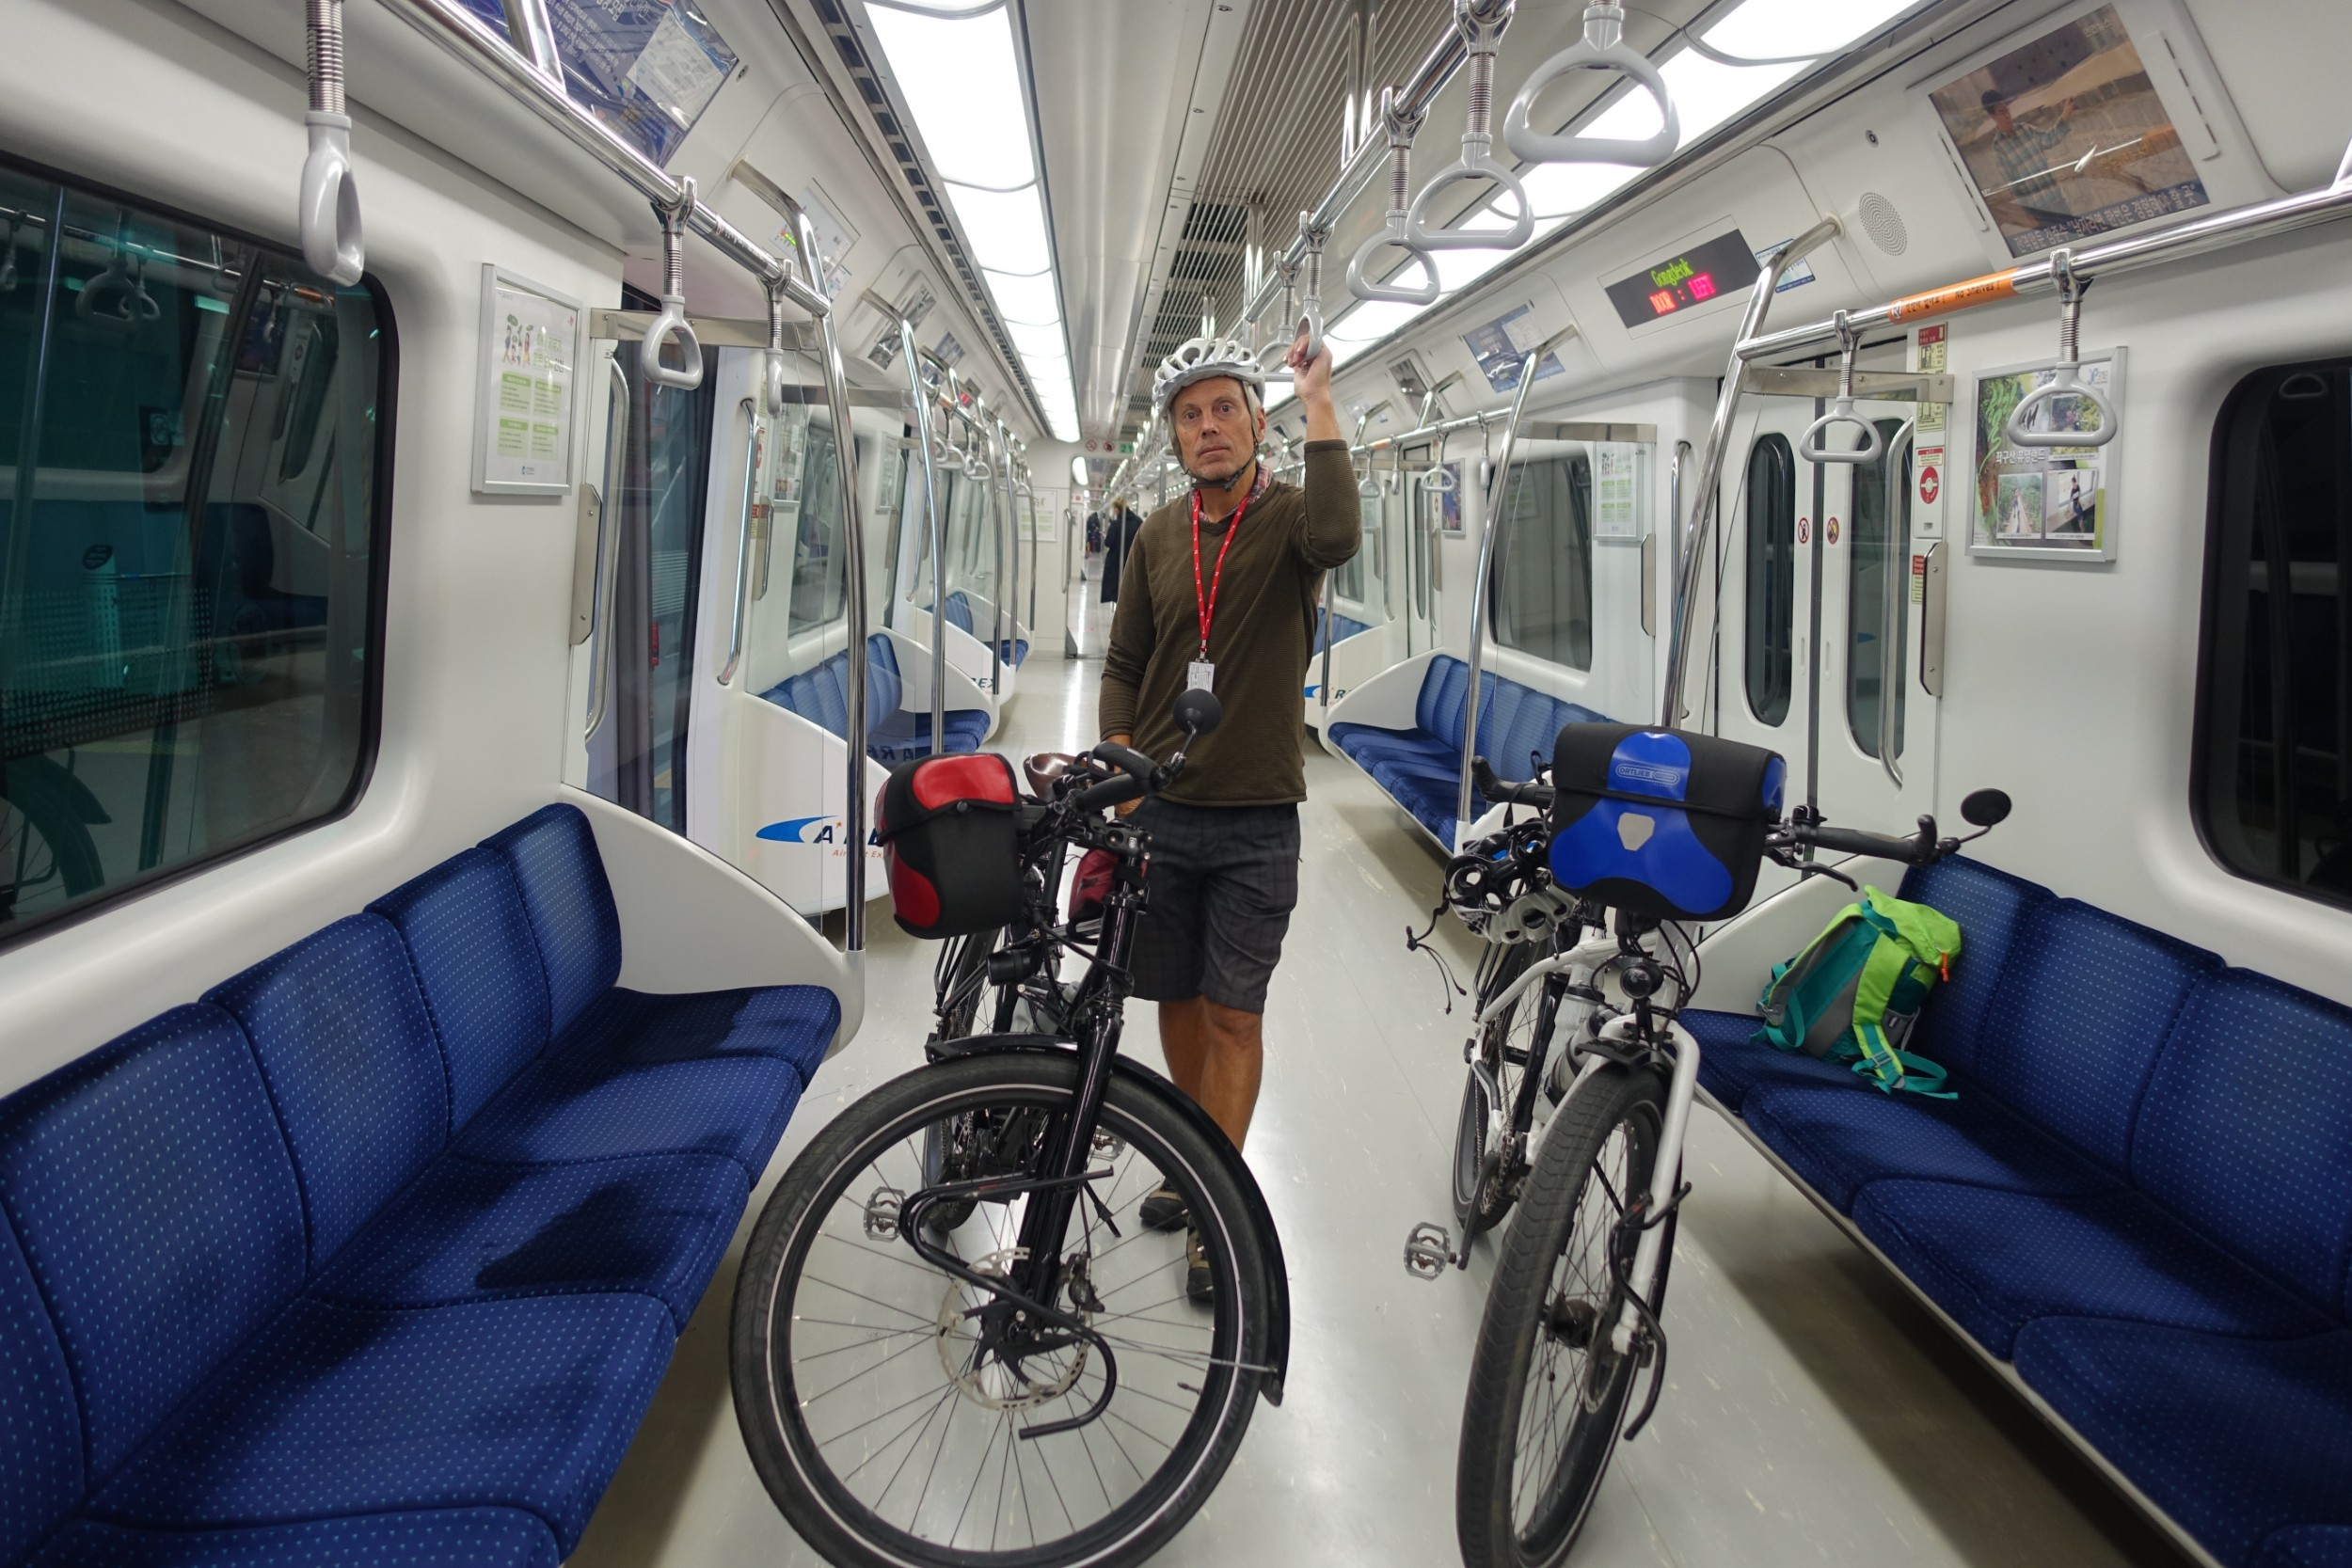 TrainDSC02608.JPG